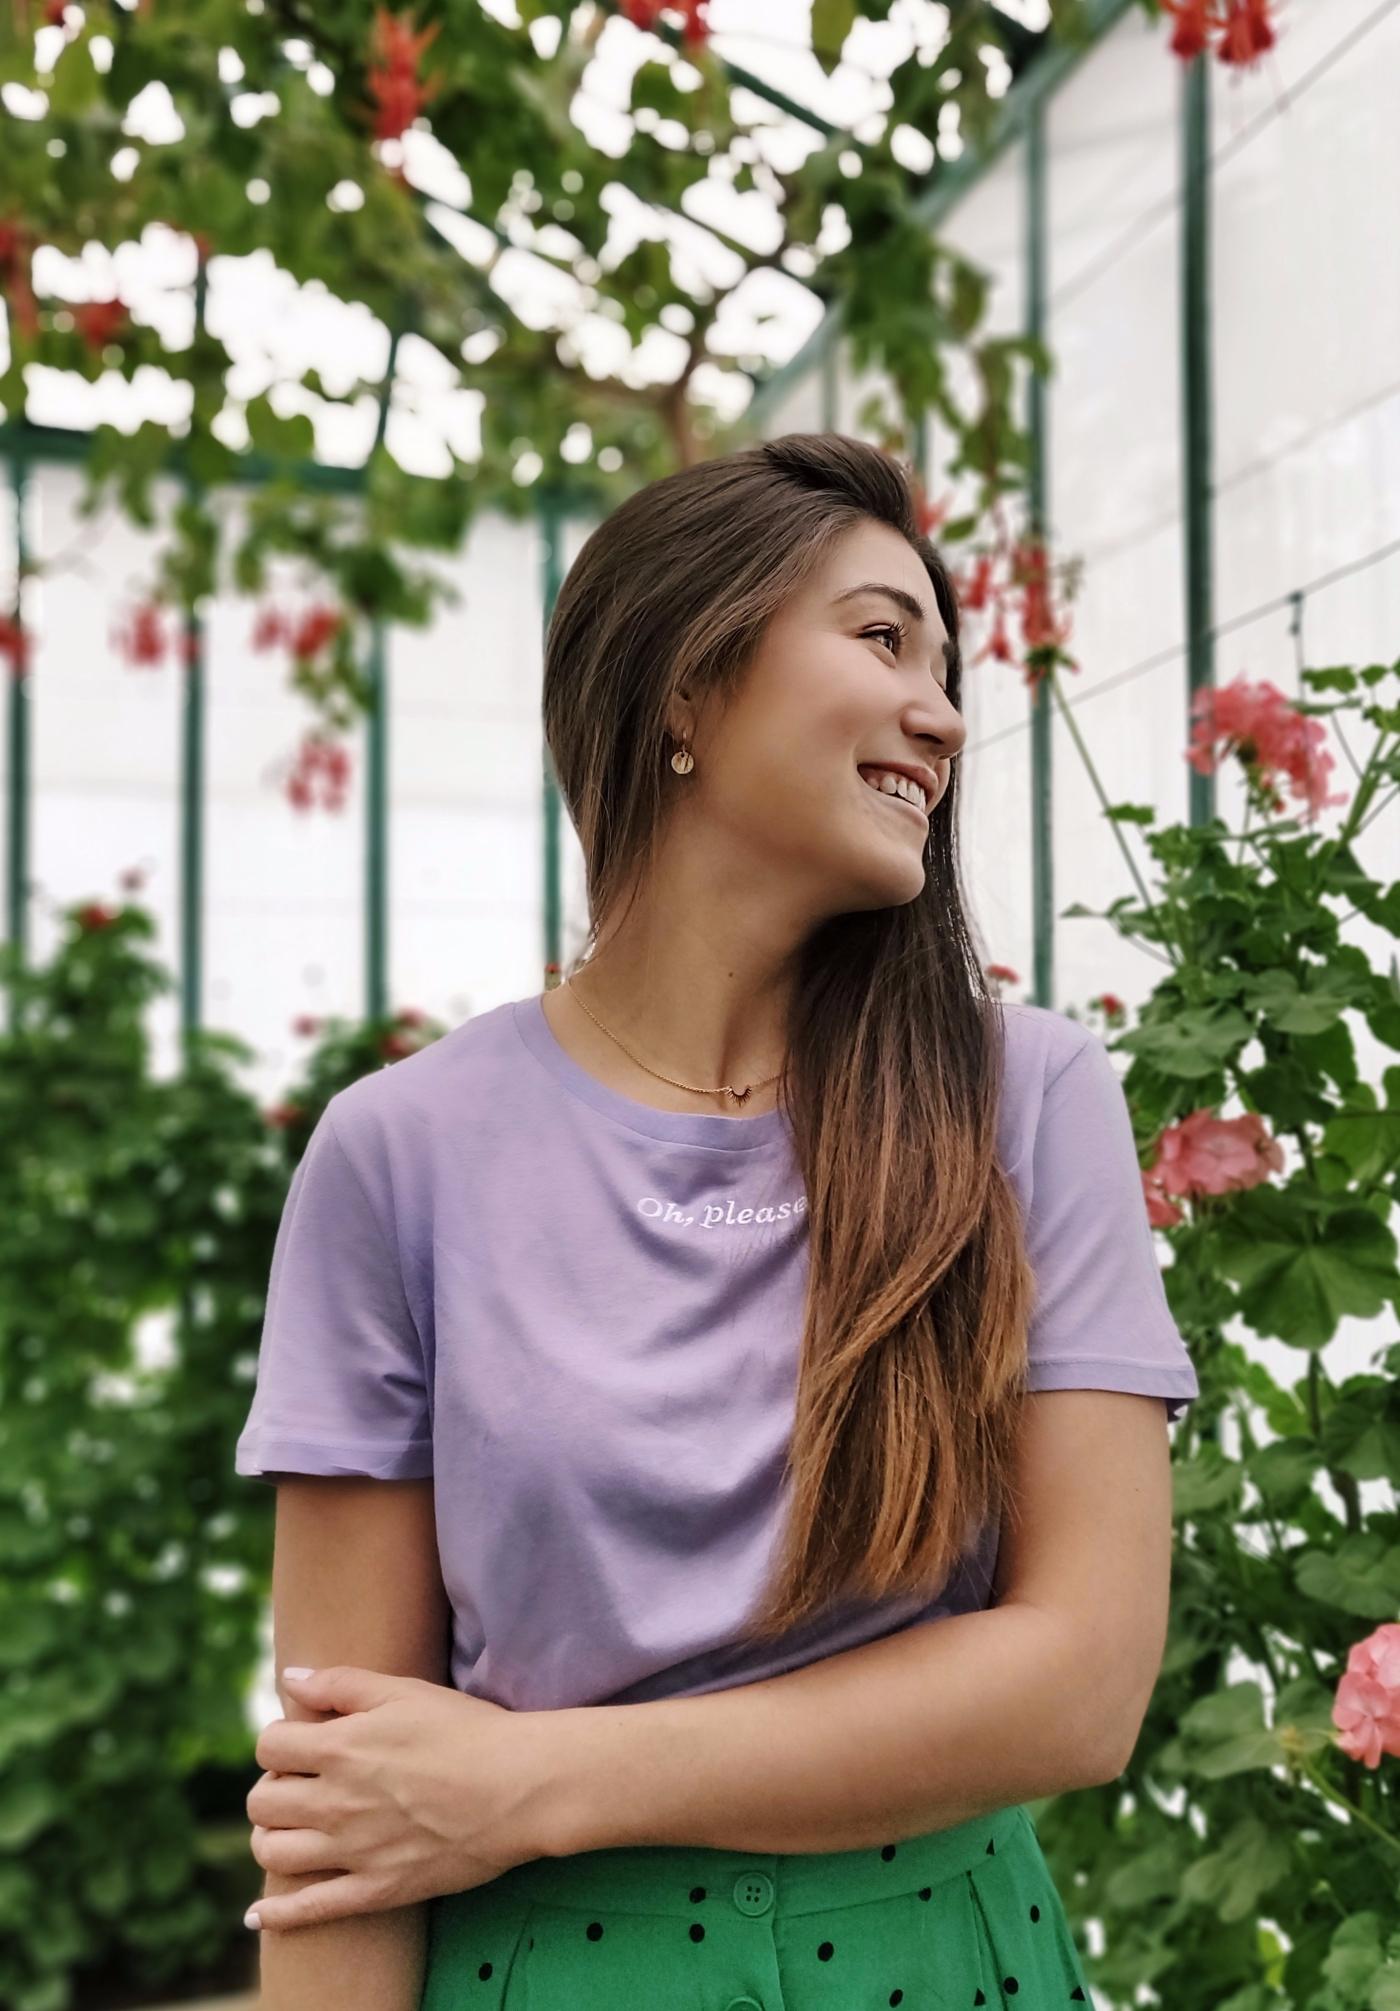 Kledingadvies - Pastelkleurige T-shirt en felgroene rok